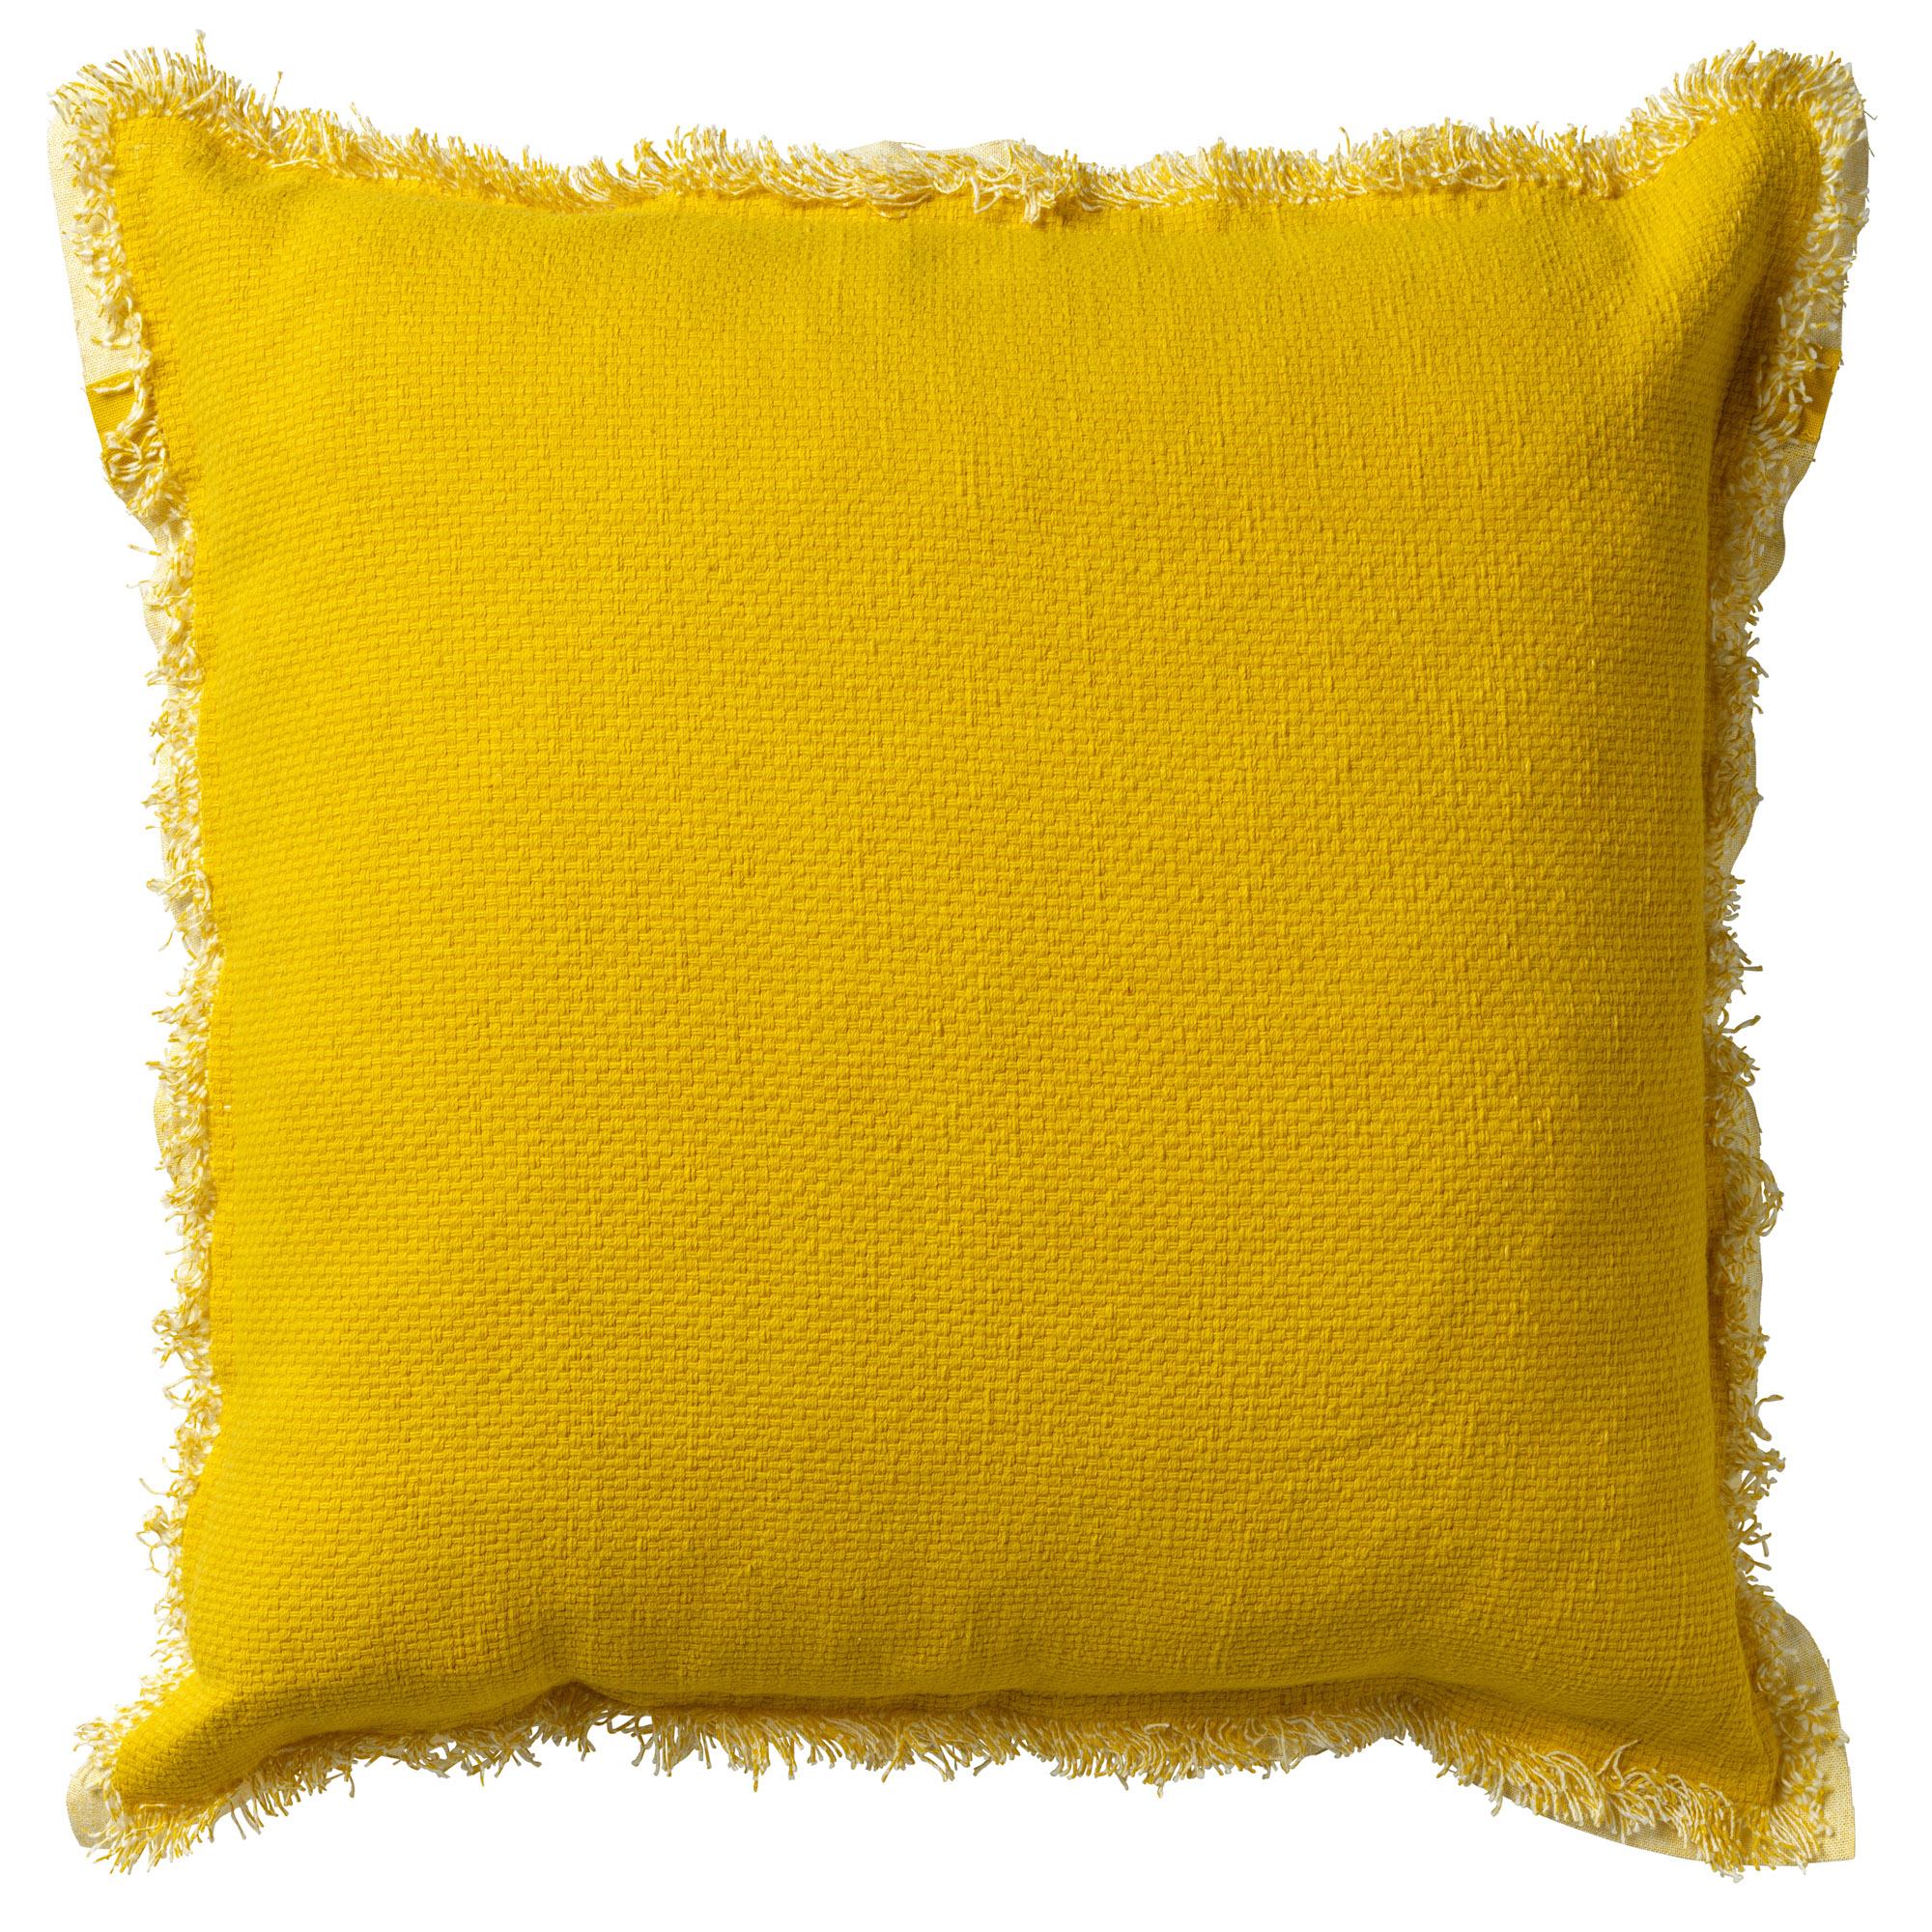 BURTO - Sierkussen van katoen Lemon 45x45 cm